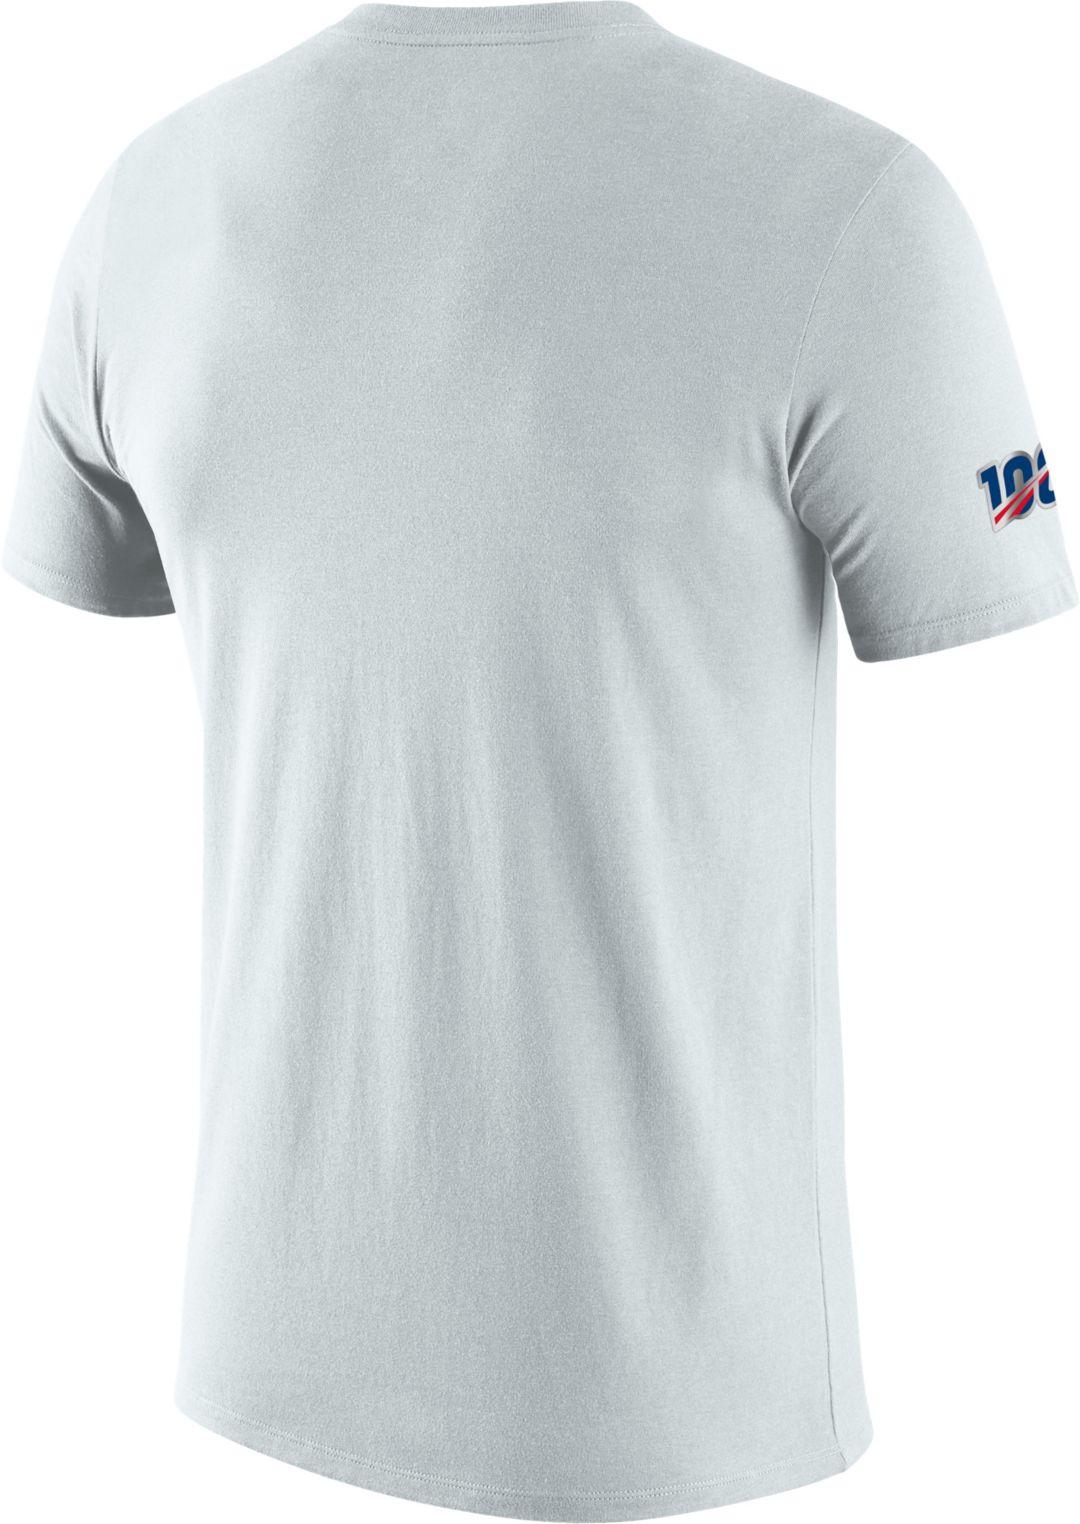 87f7fbc4 Nike Men's Houston Texans 100th Sideline Legend Performance White T-Shirt